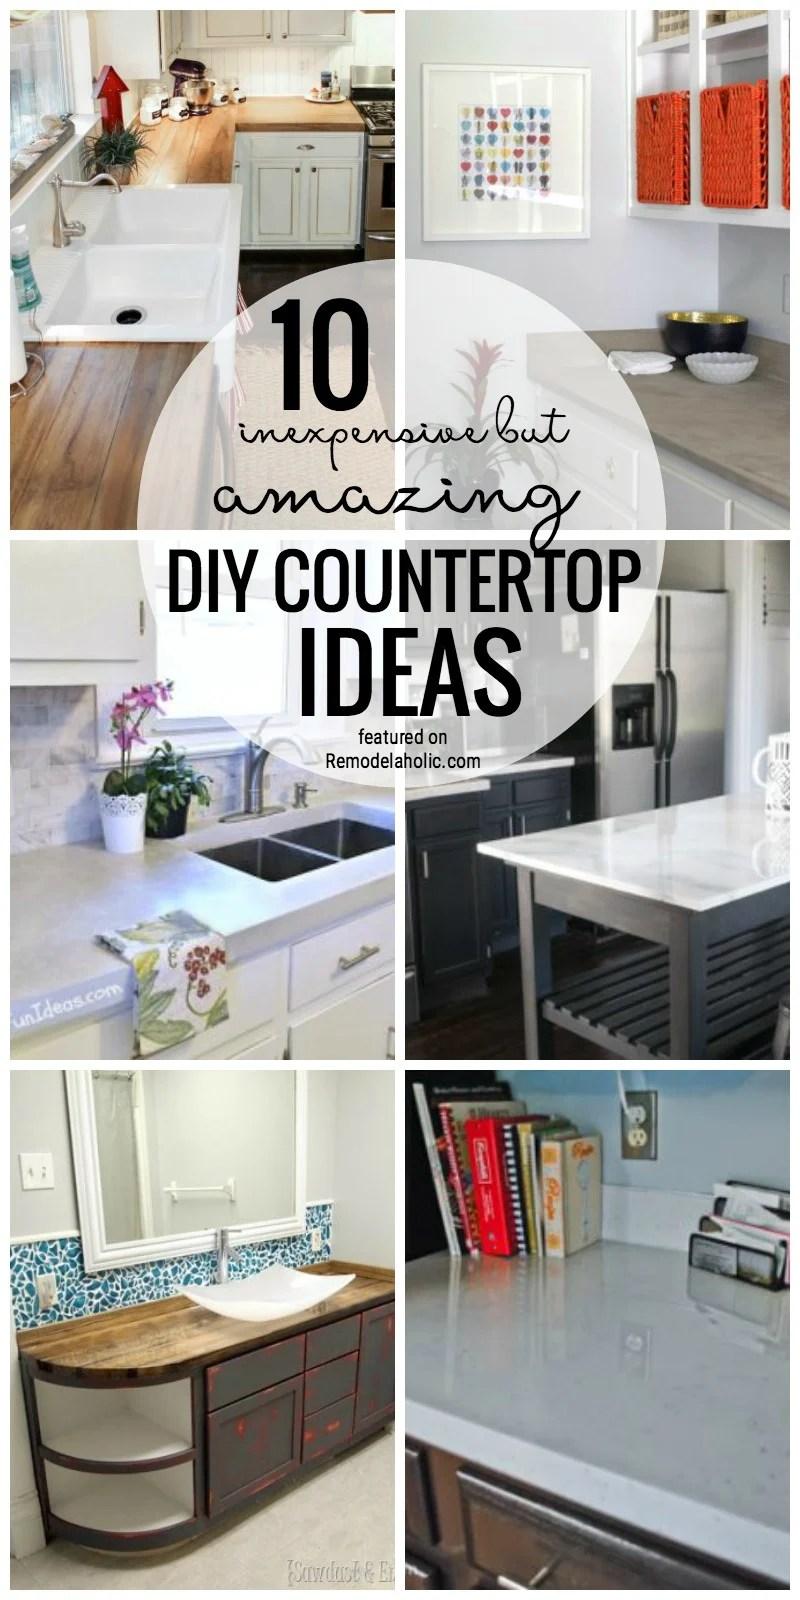 Bon 10 Inexpensive But Amazing DIY Countertop Ideas